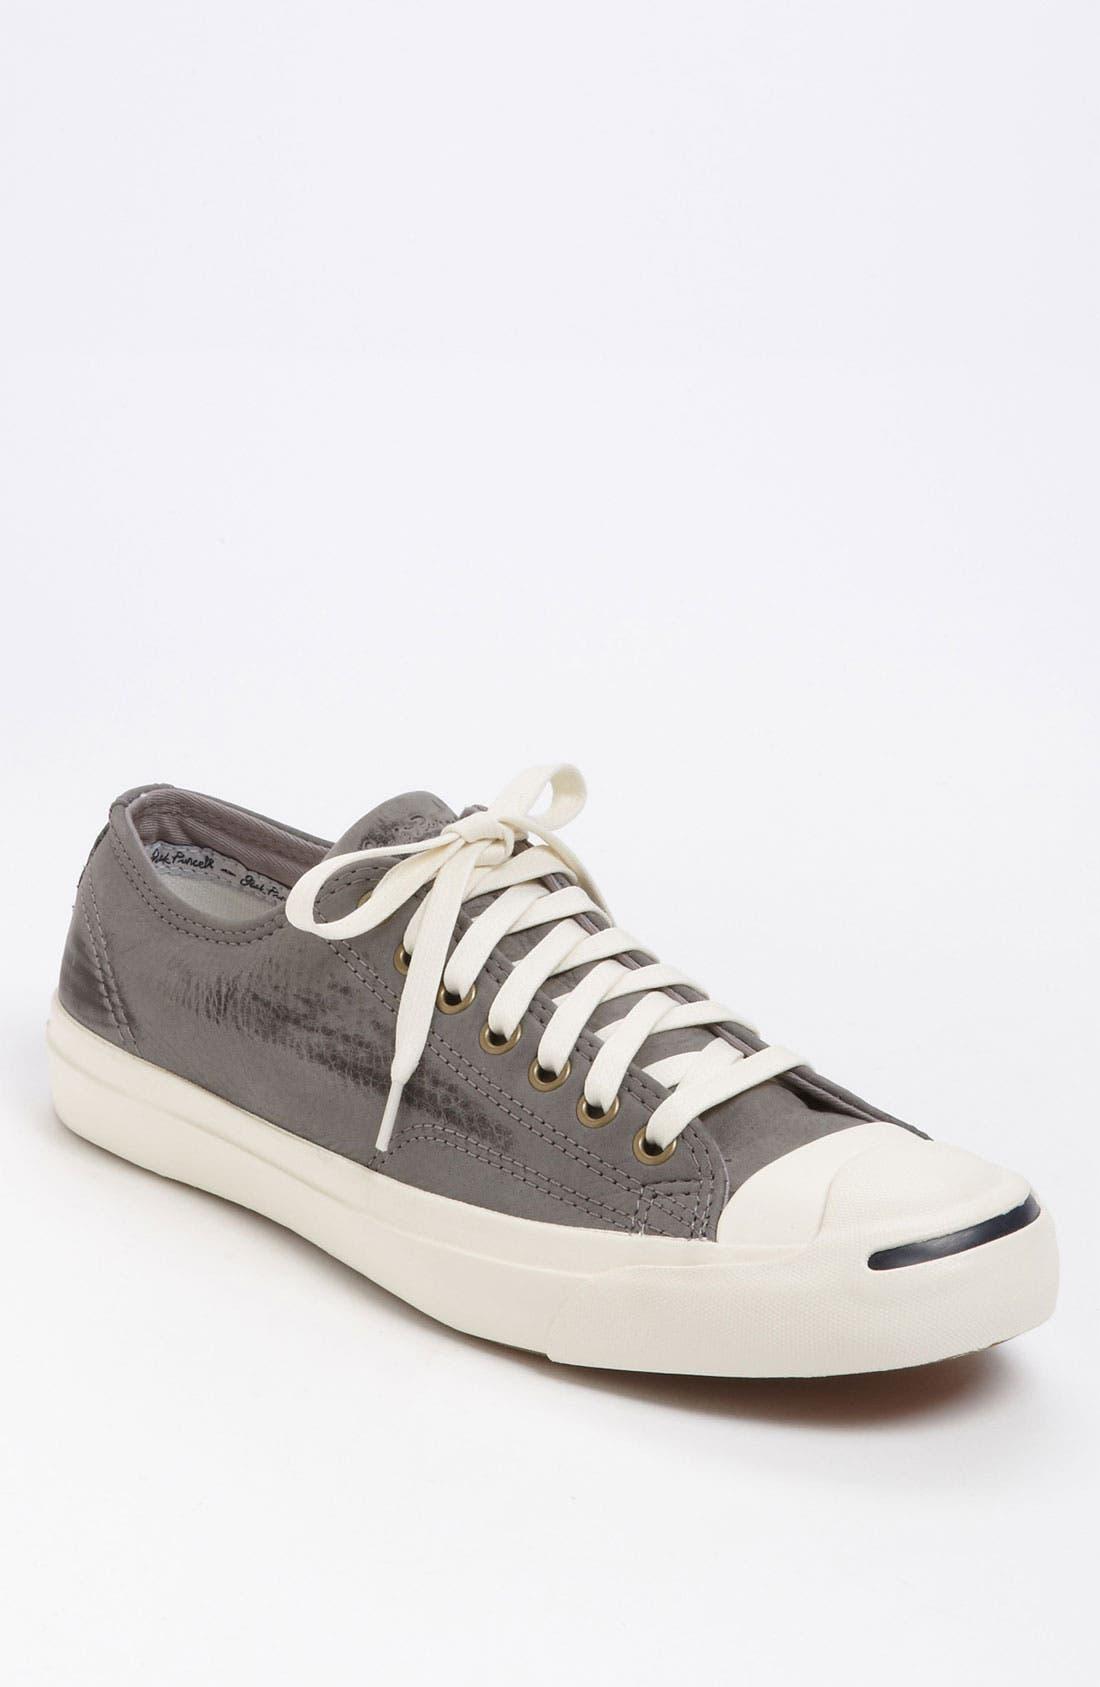 Main Image - Converse 'Jack Purcell LTT' Leather Sneaker (Men)